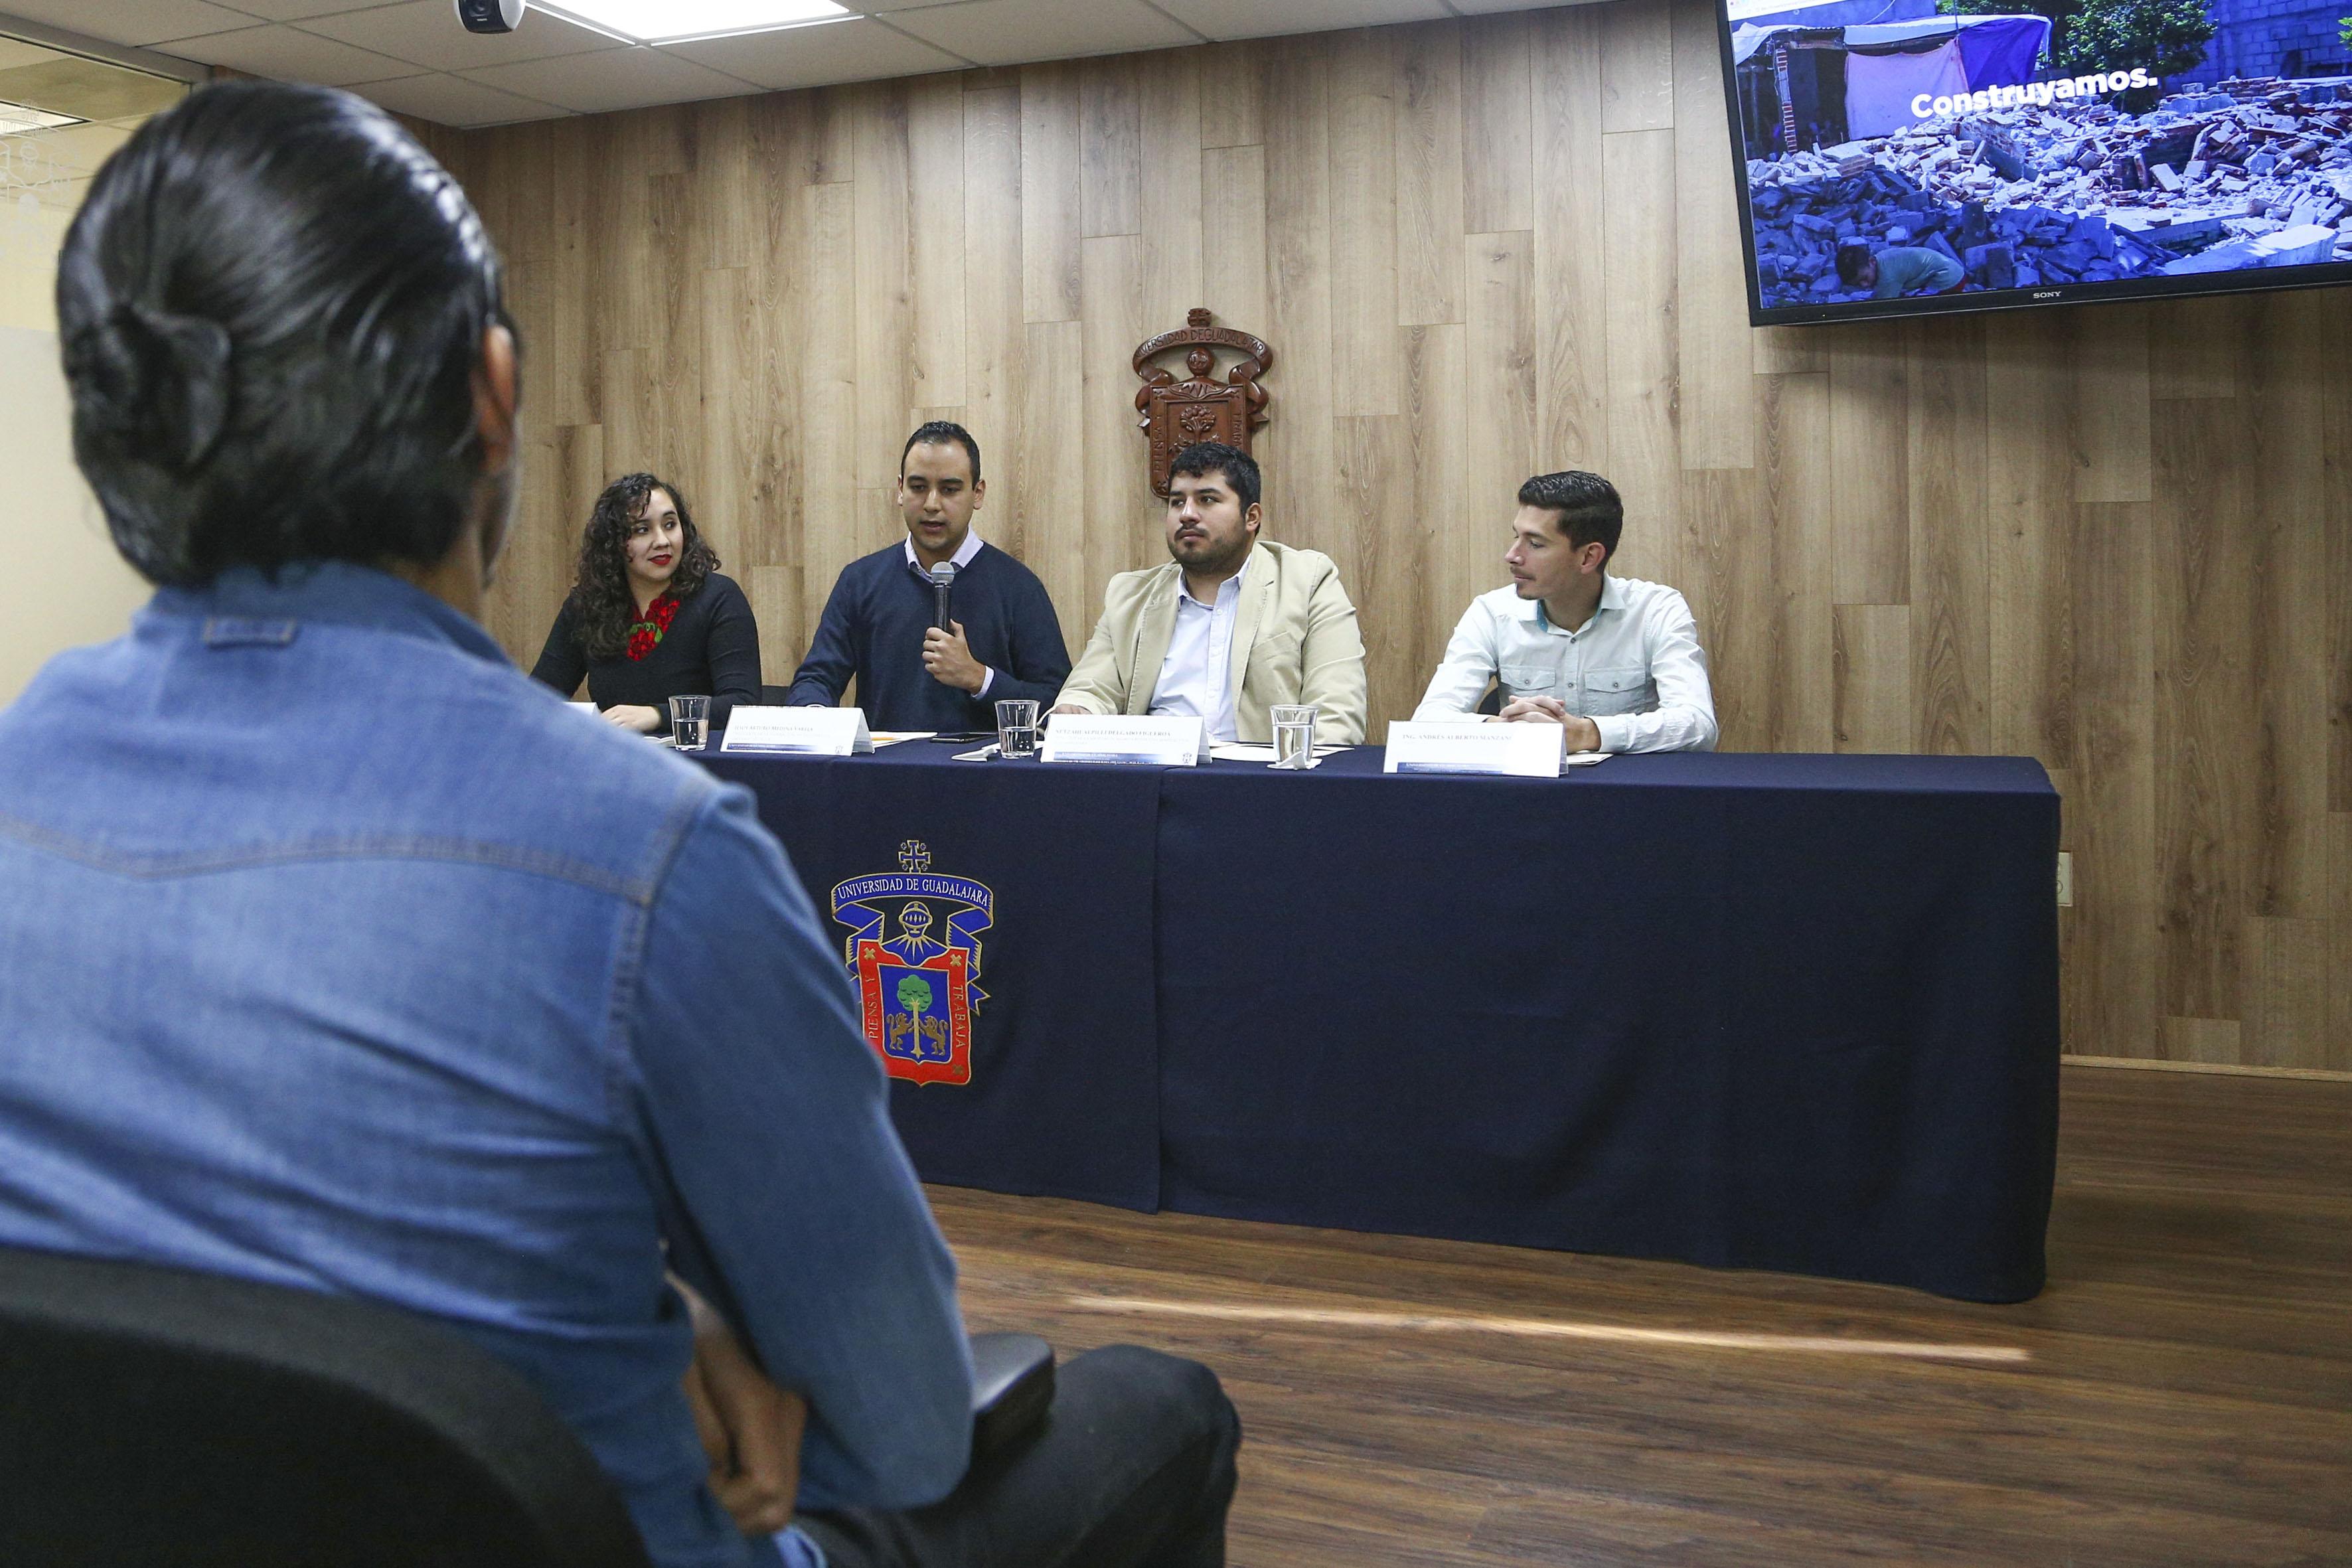 Presidente de la FEU, Jesús Medina Varela, haciendo uso de la palabra